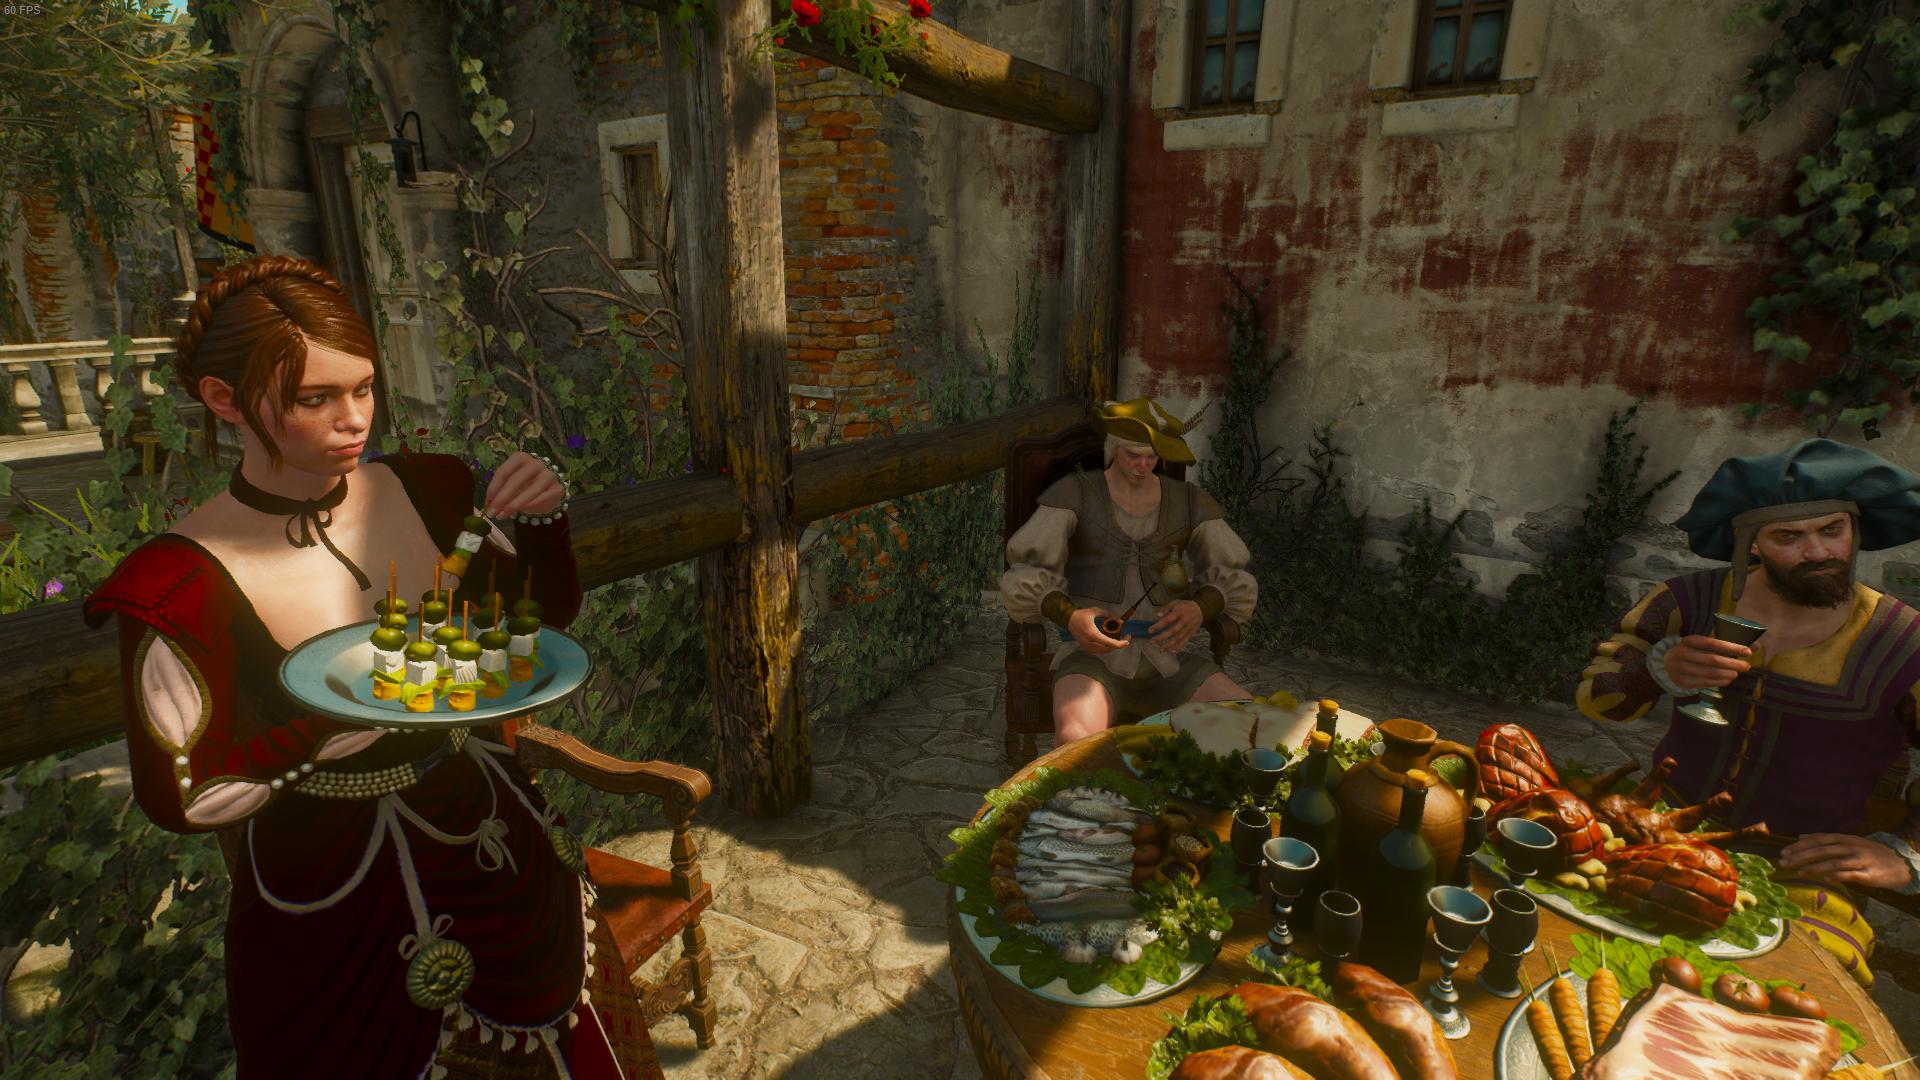 Food - The Witcher 3: Wild Hunt